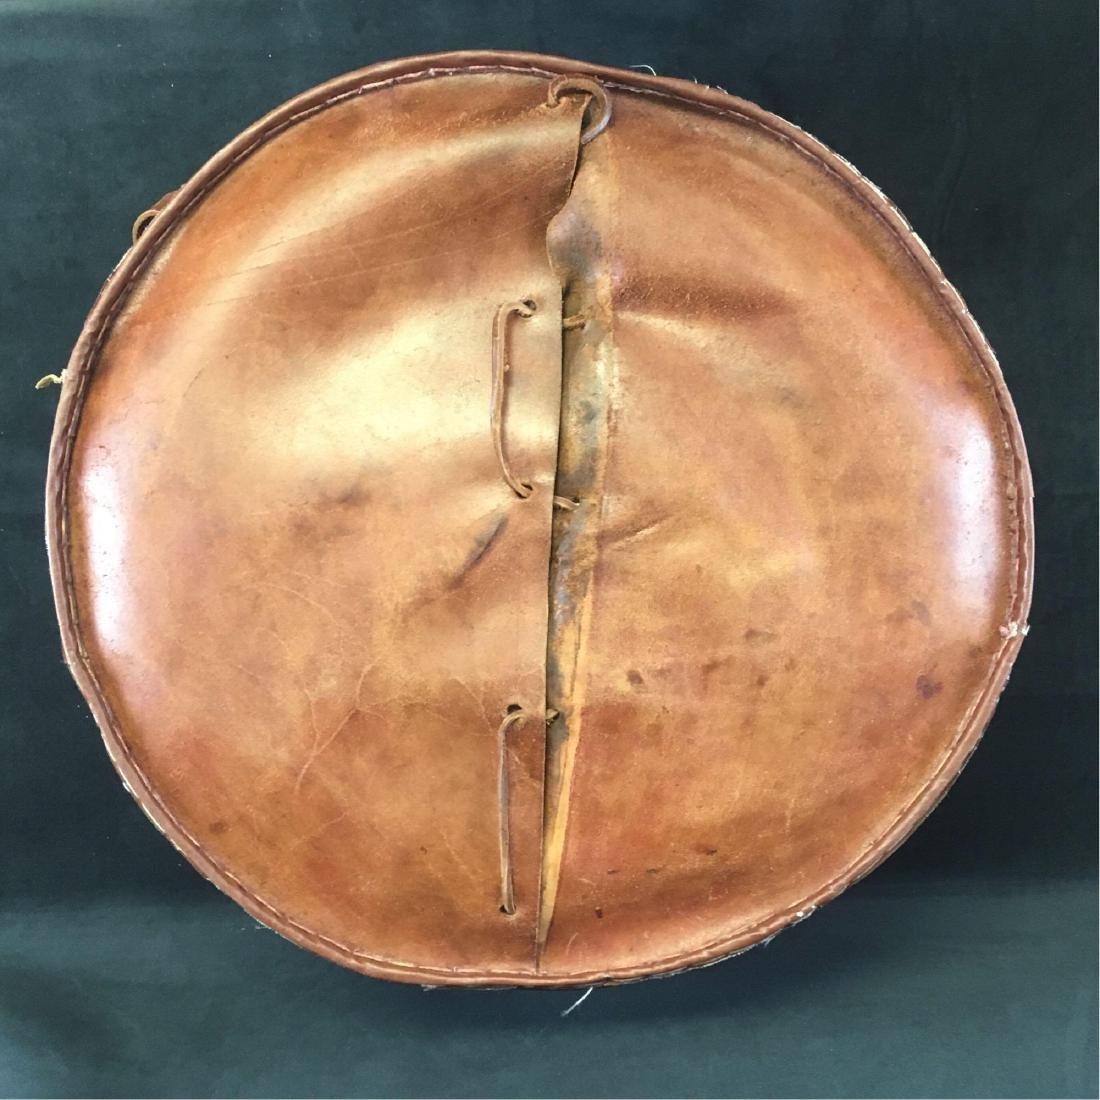 Vintage Peruvian Leather Stool - 7